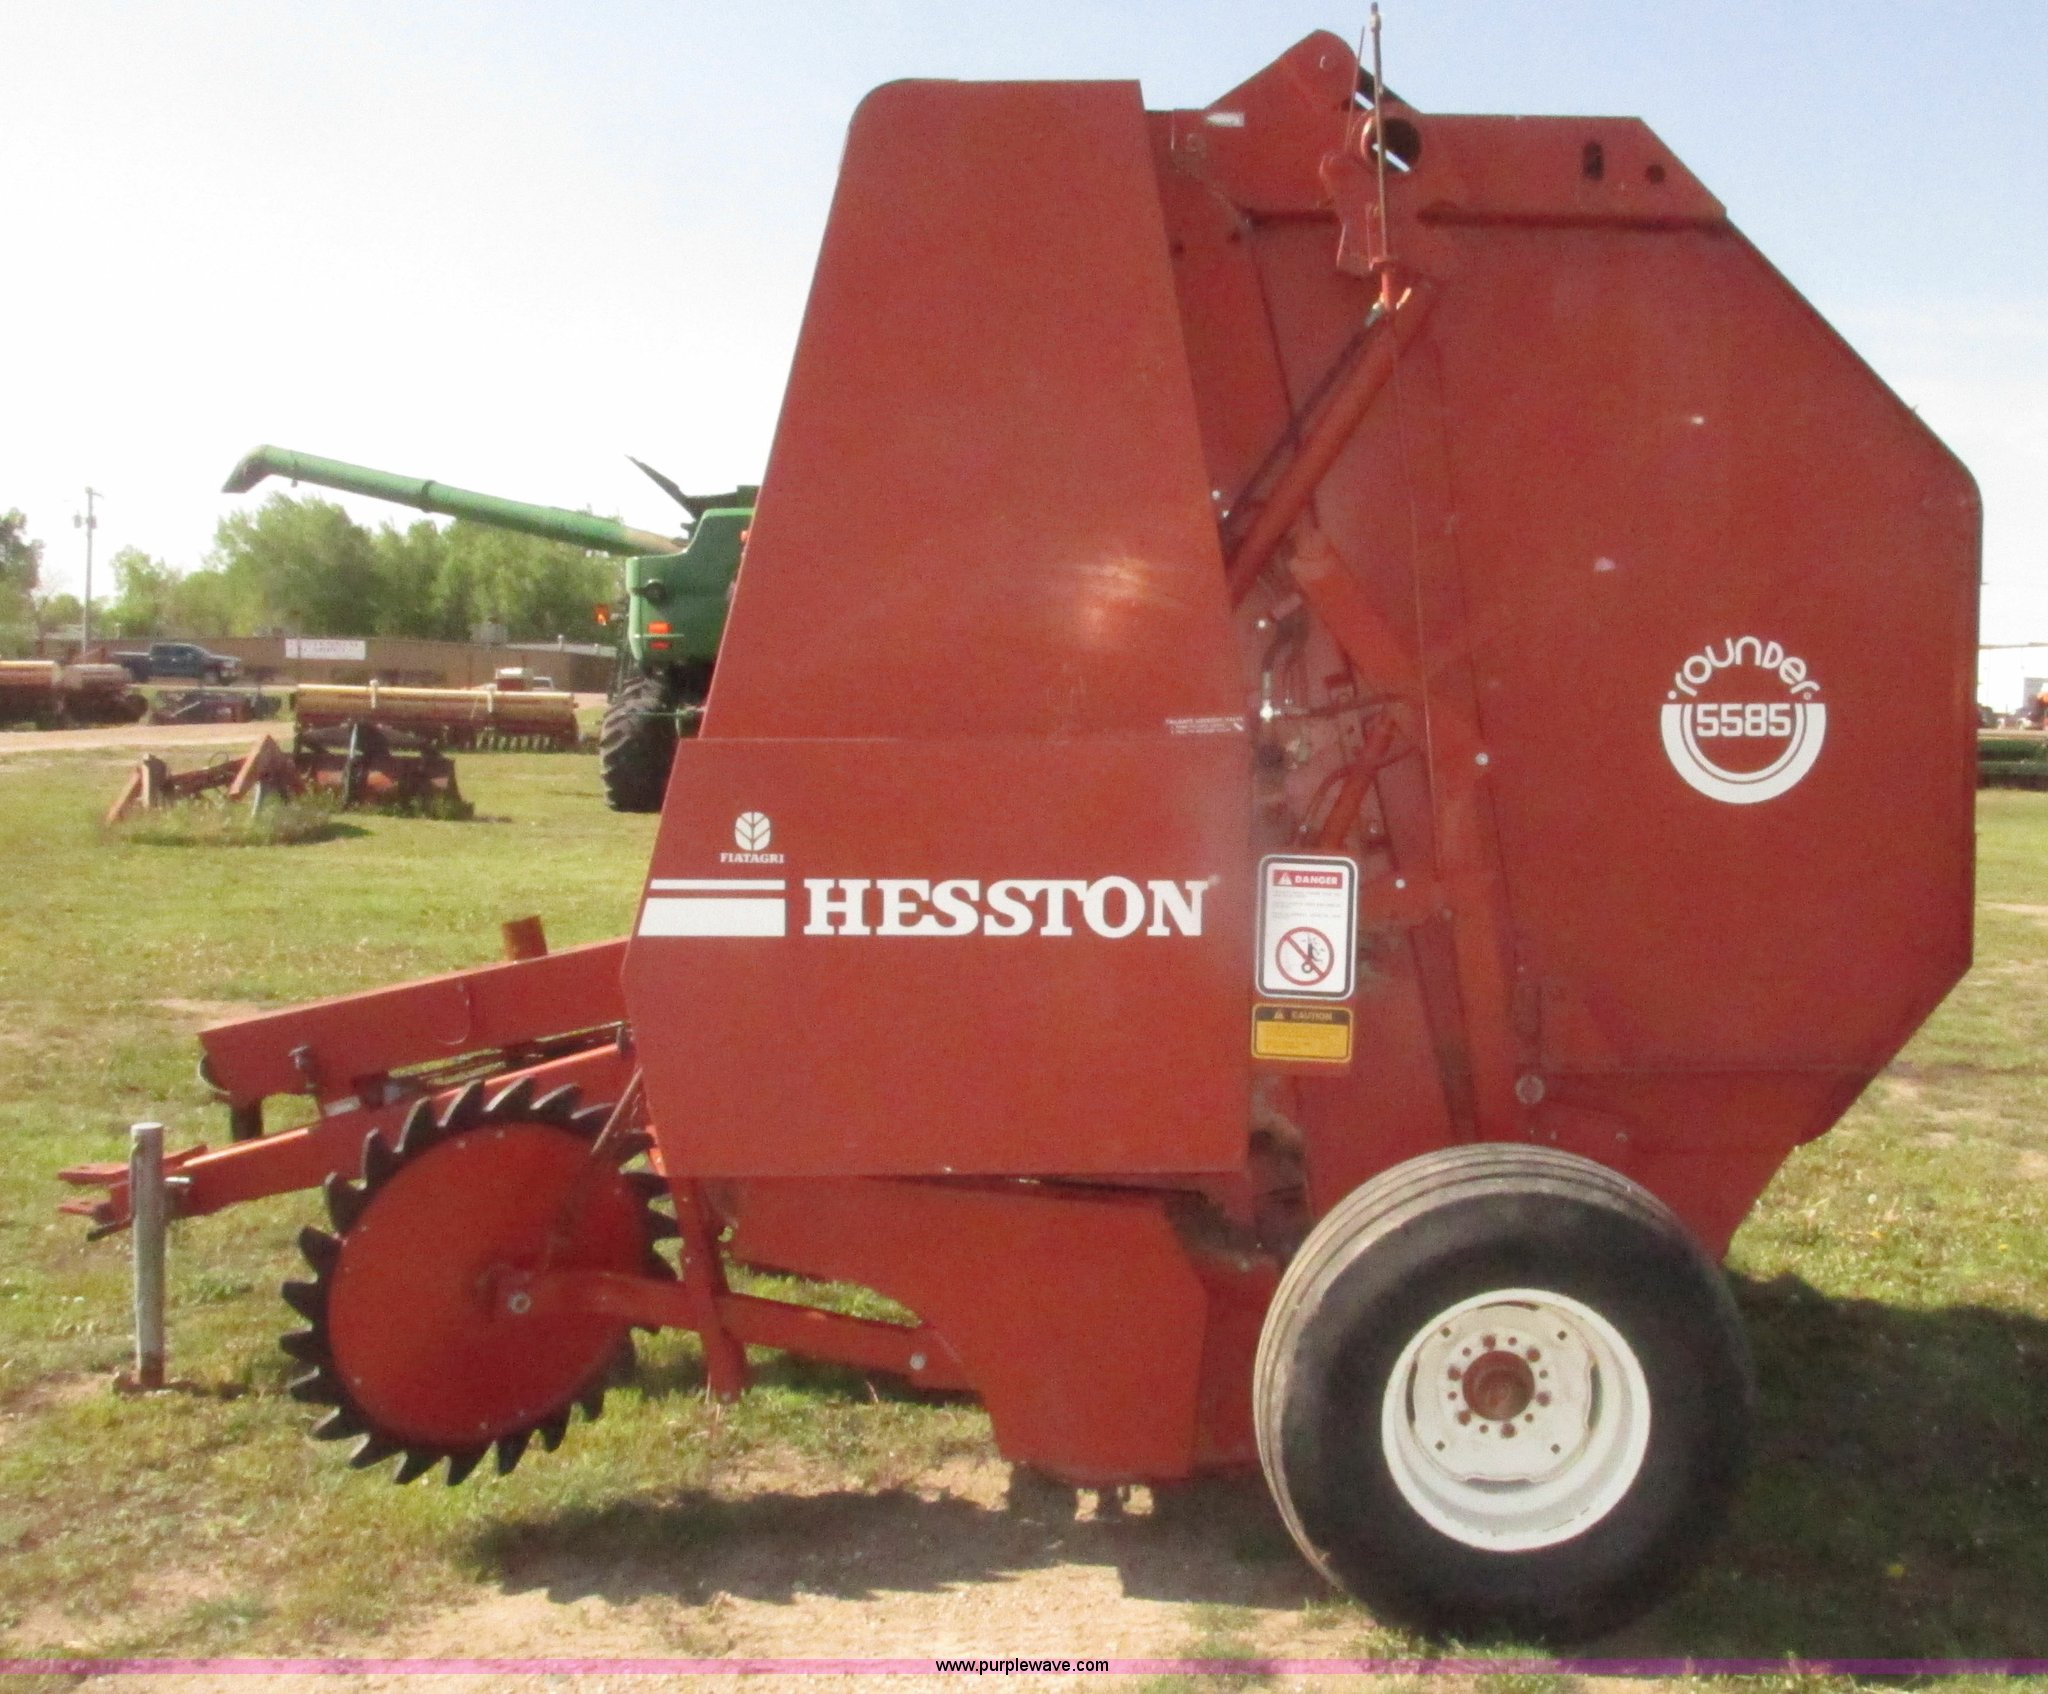 ... Hesston 5585 round baler Full size in new window ...